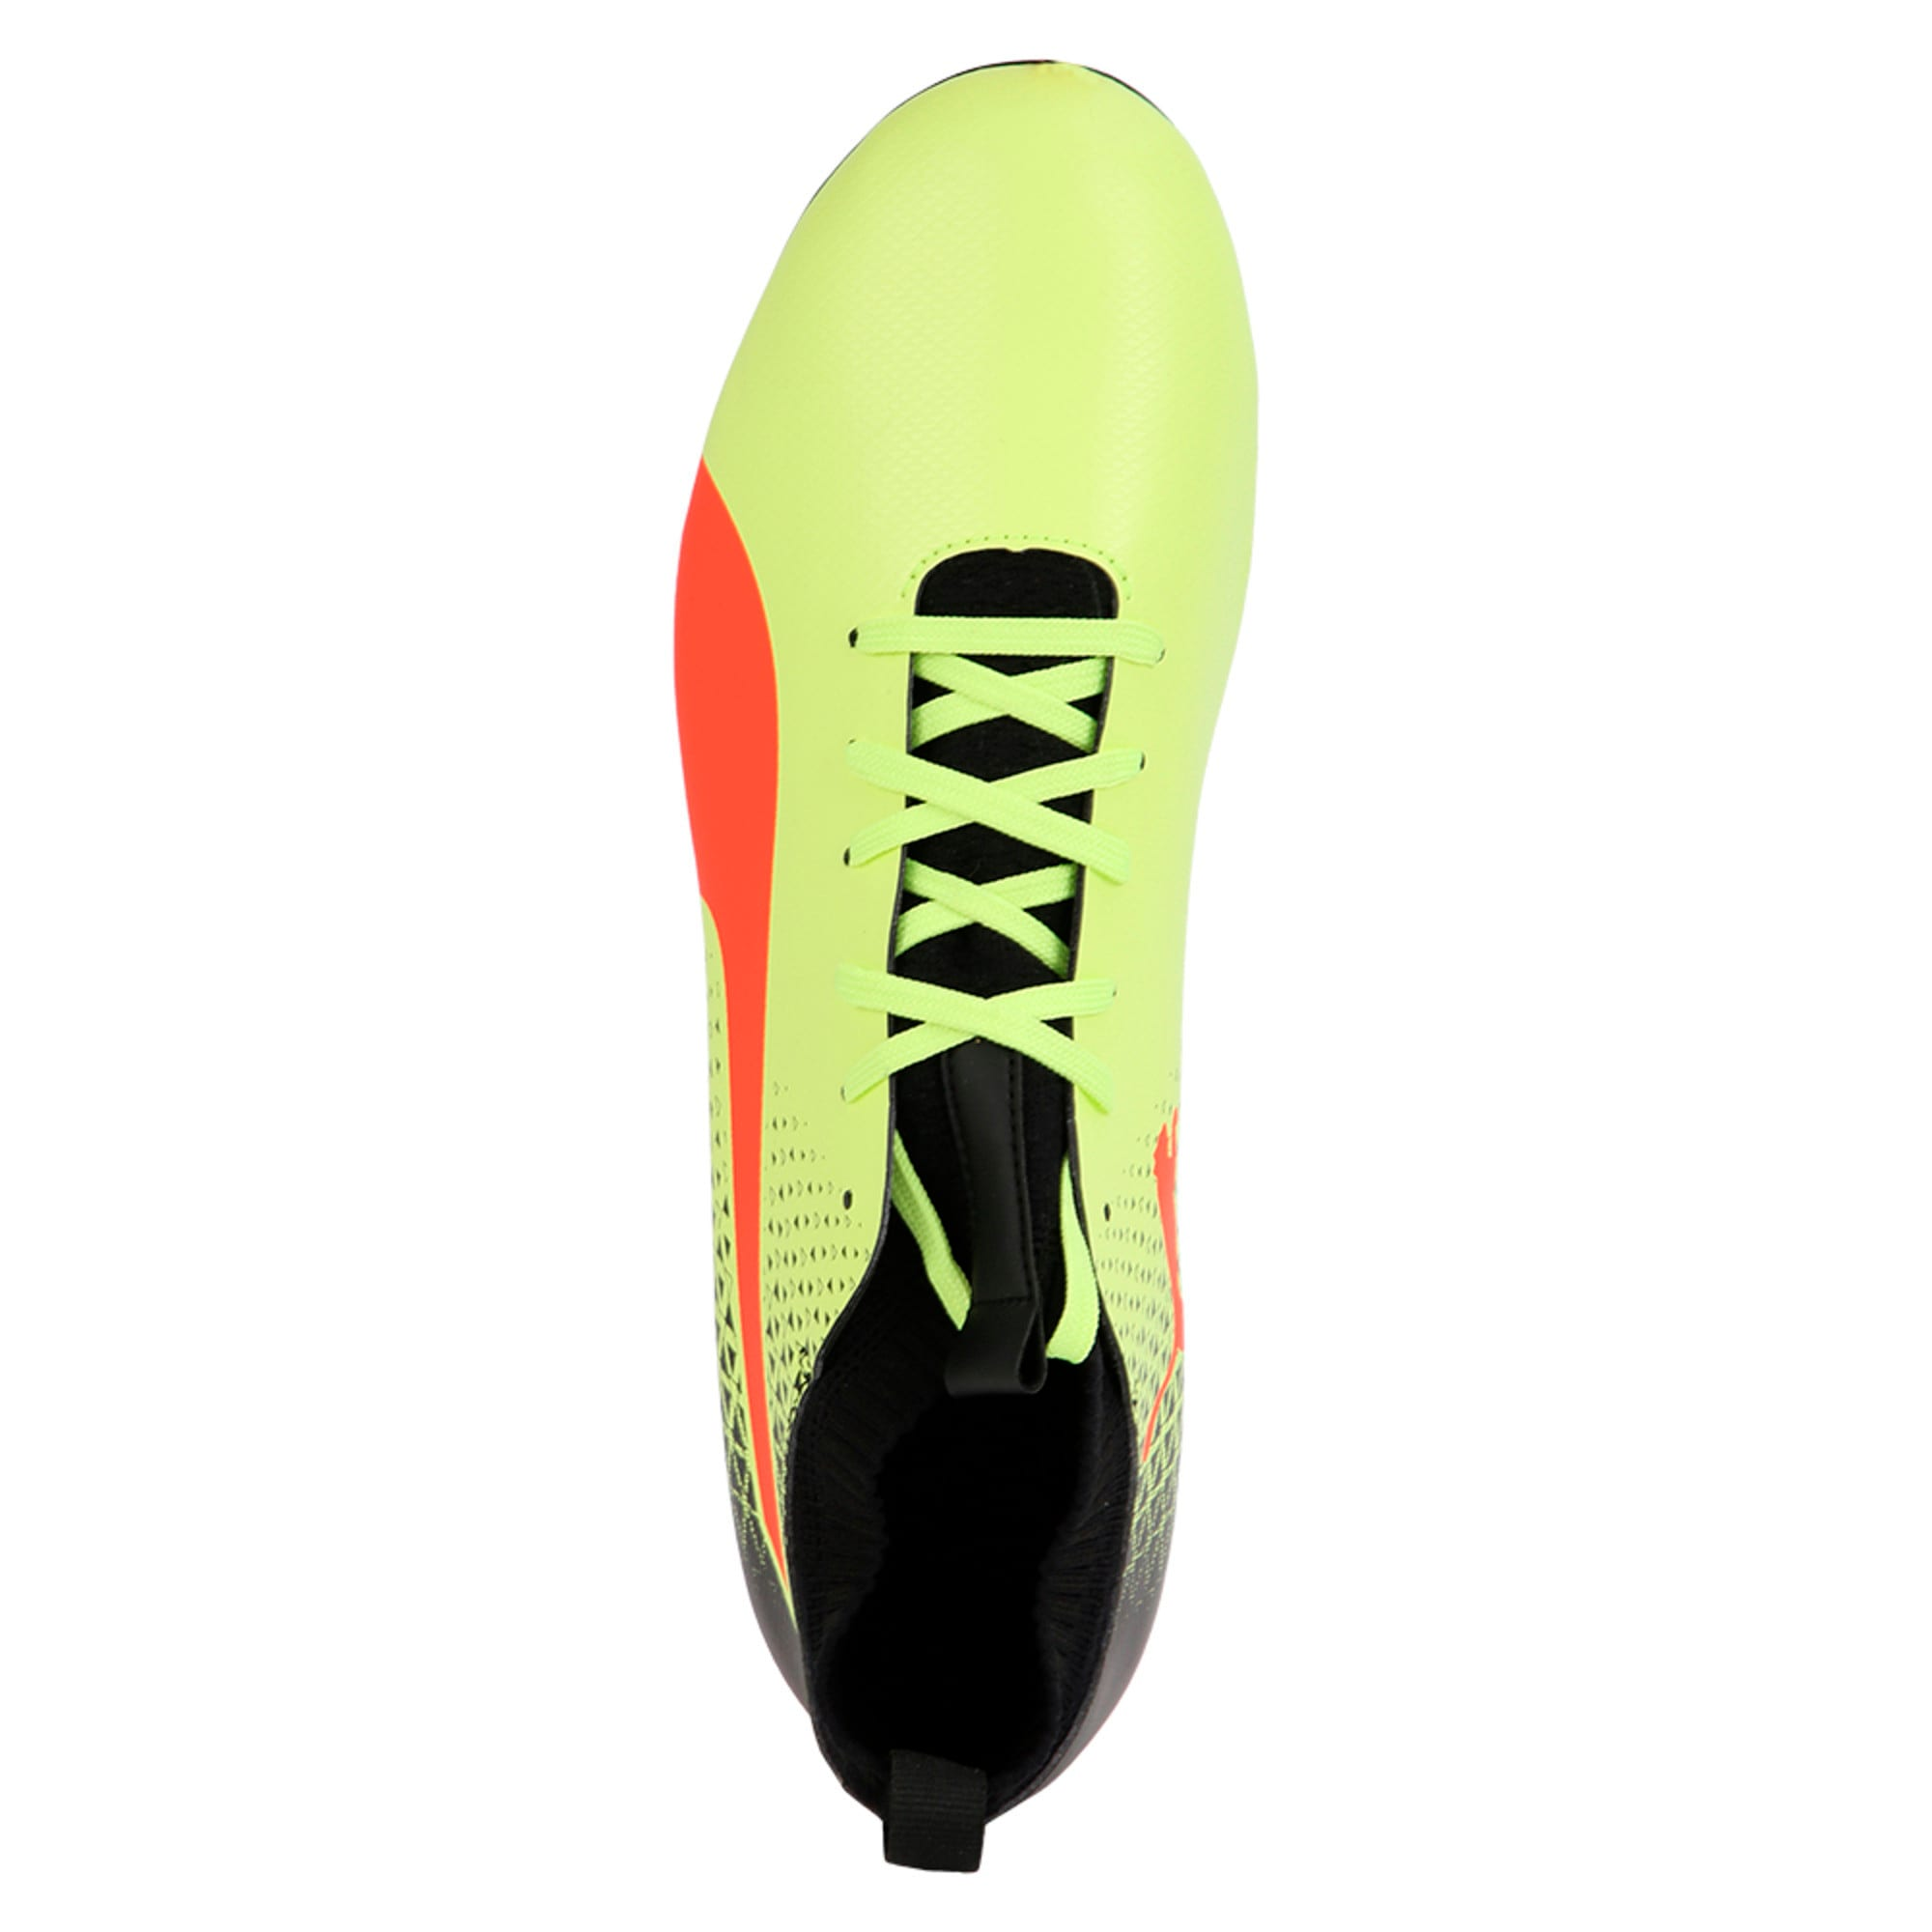 Thumbnail 4 of evoKNIT FG Men's Football Boots, Yellow-Red-Black, medium-IND